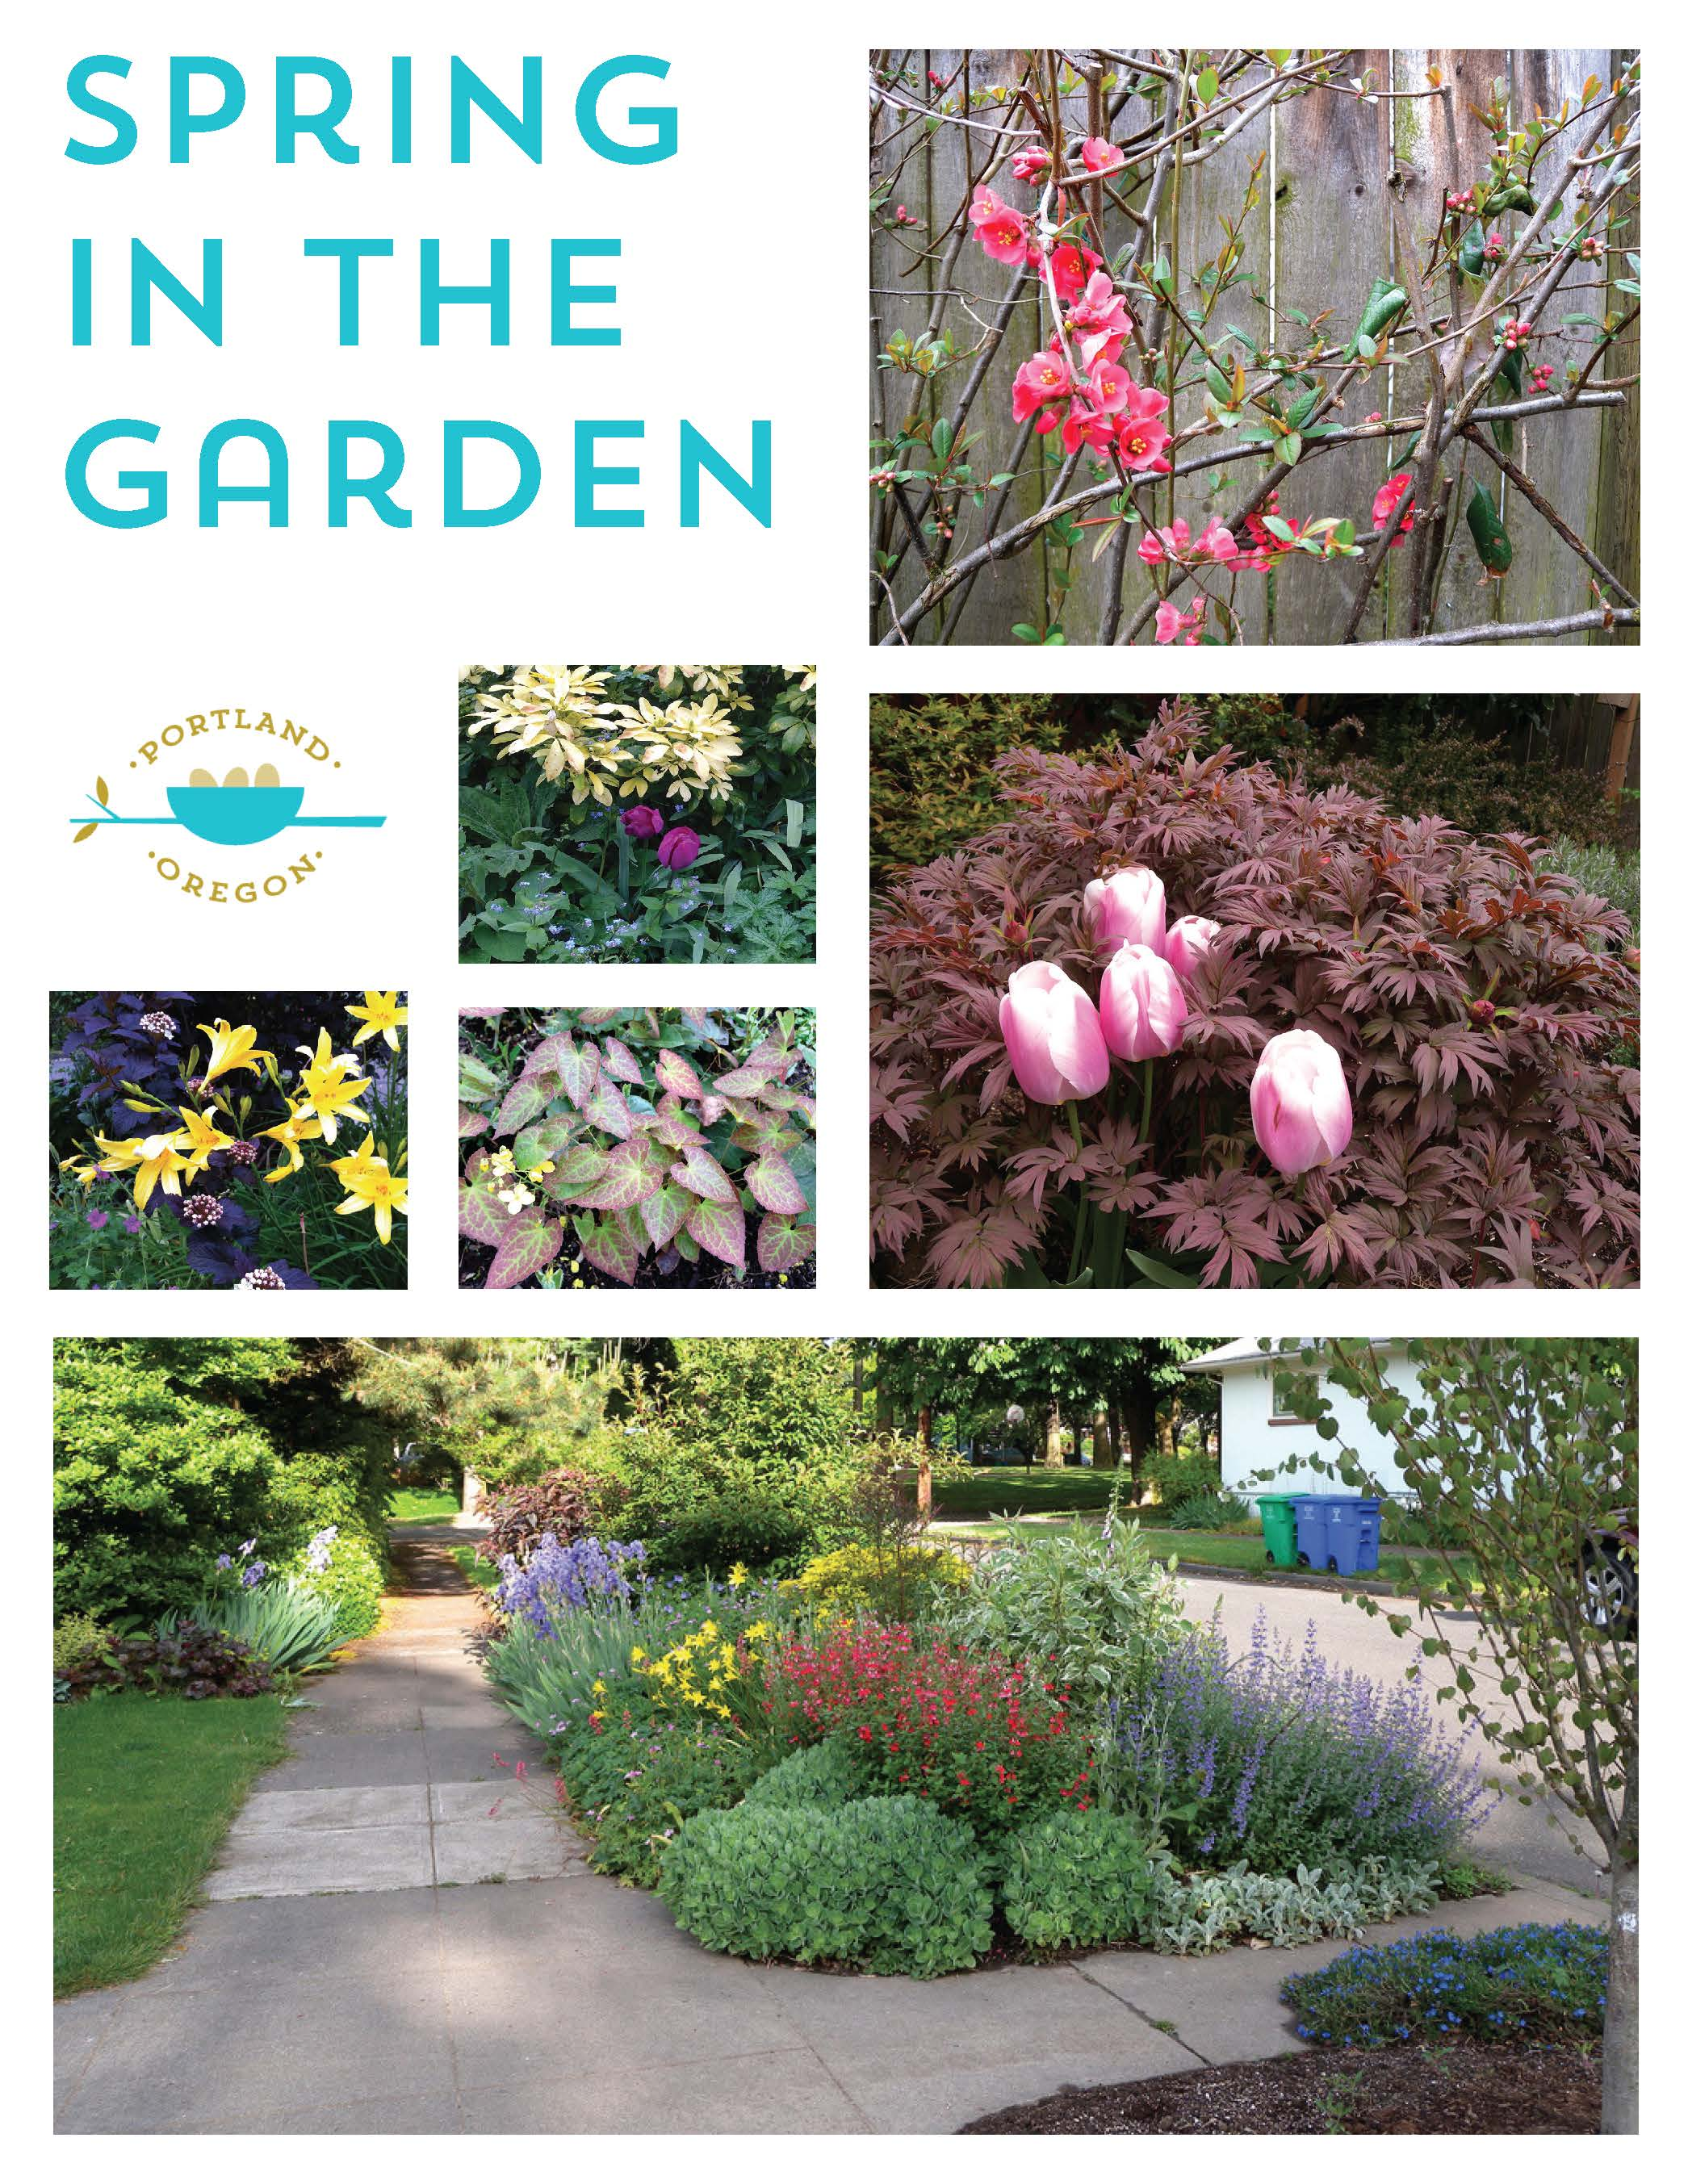 spring garden _Page_1.jpg